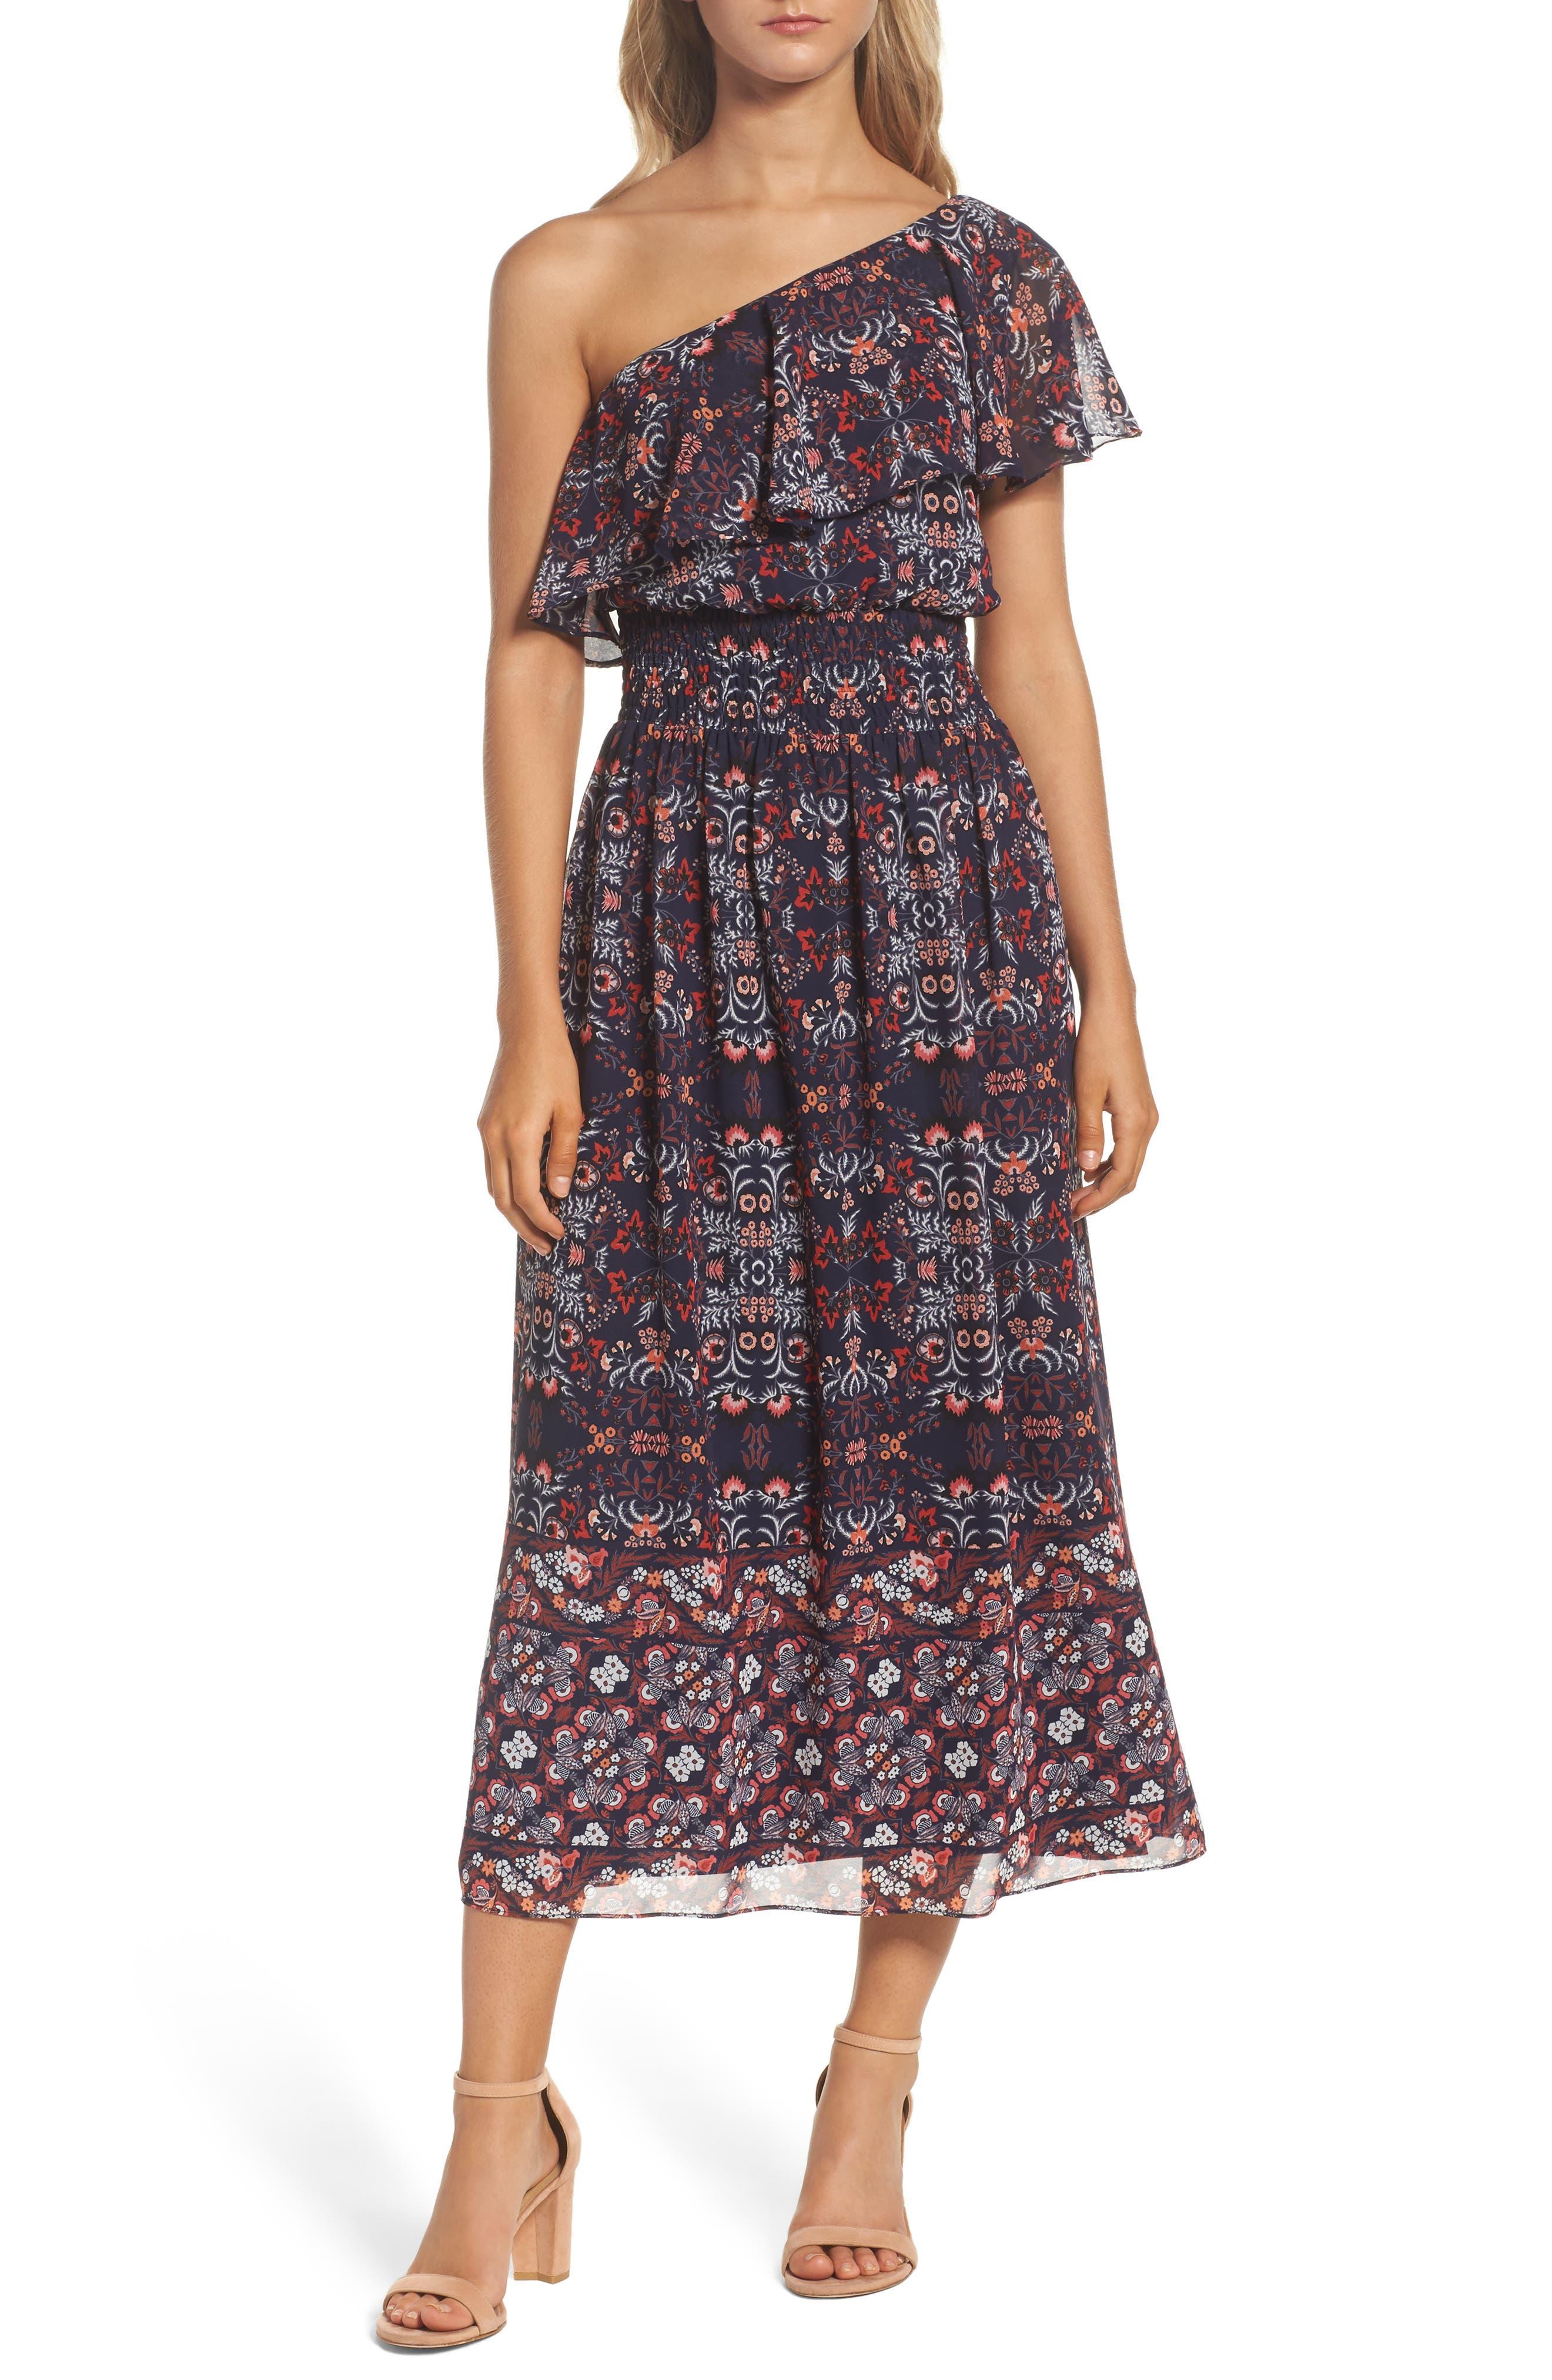 Alternate Image 1 Selected - Vince Camuto One-Shoulder Midi Dress